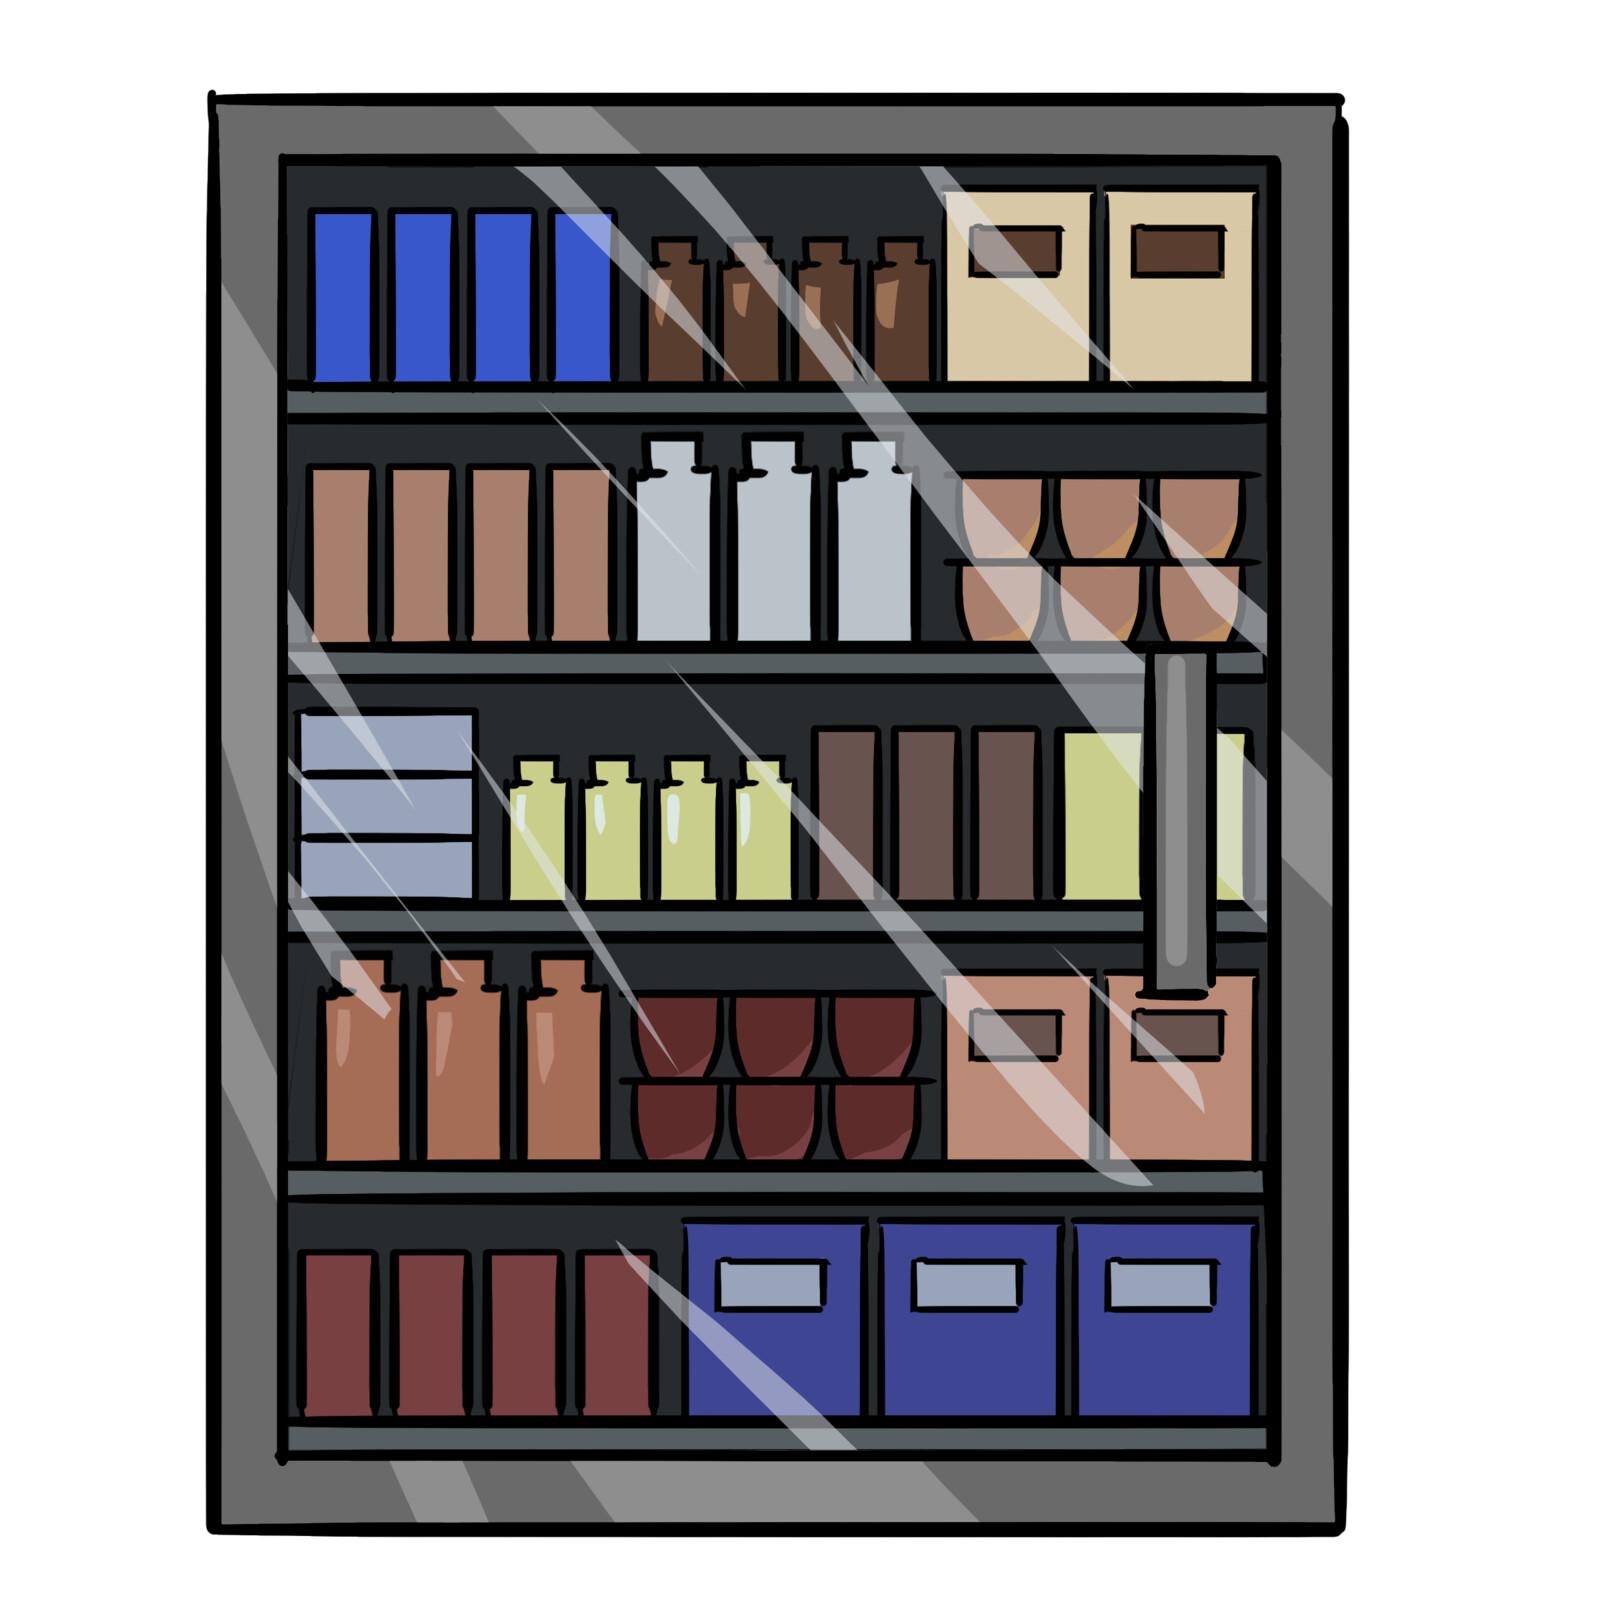 Background sprite - a store shelf